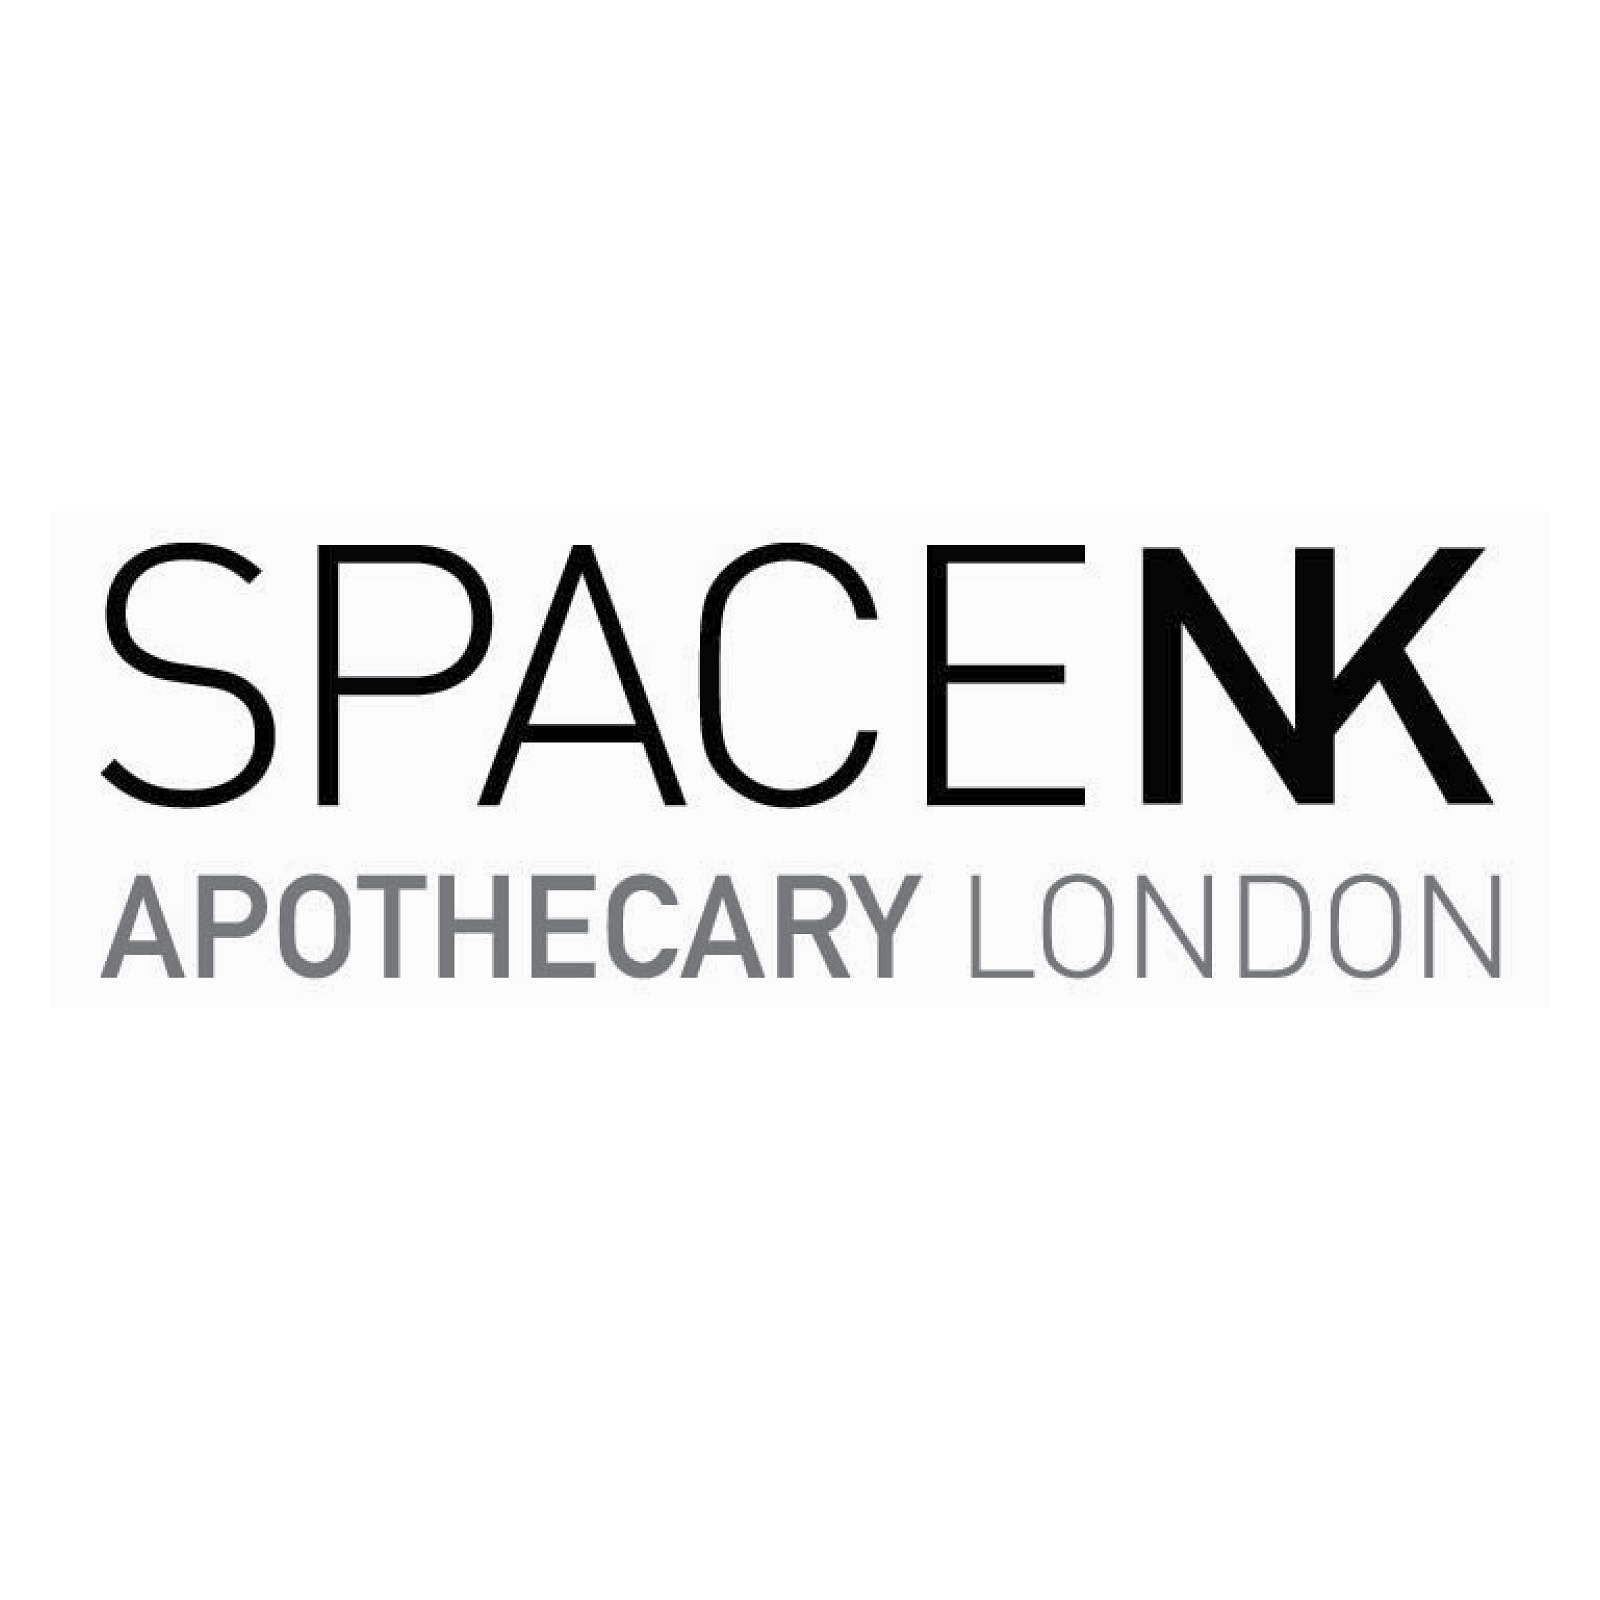 spacenk.png